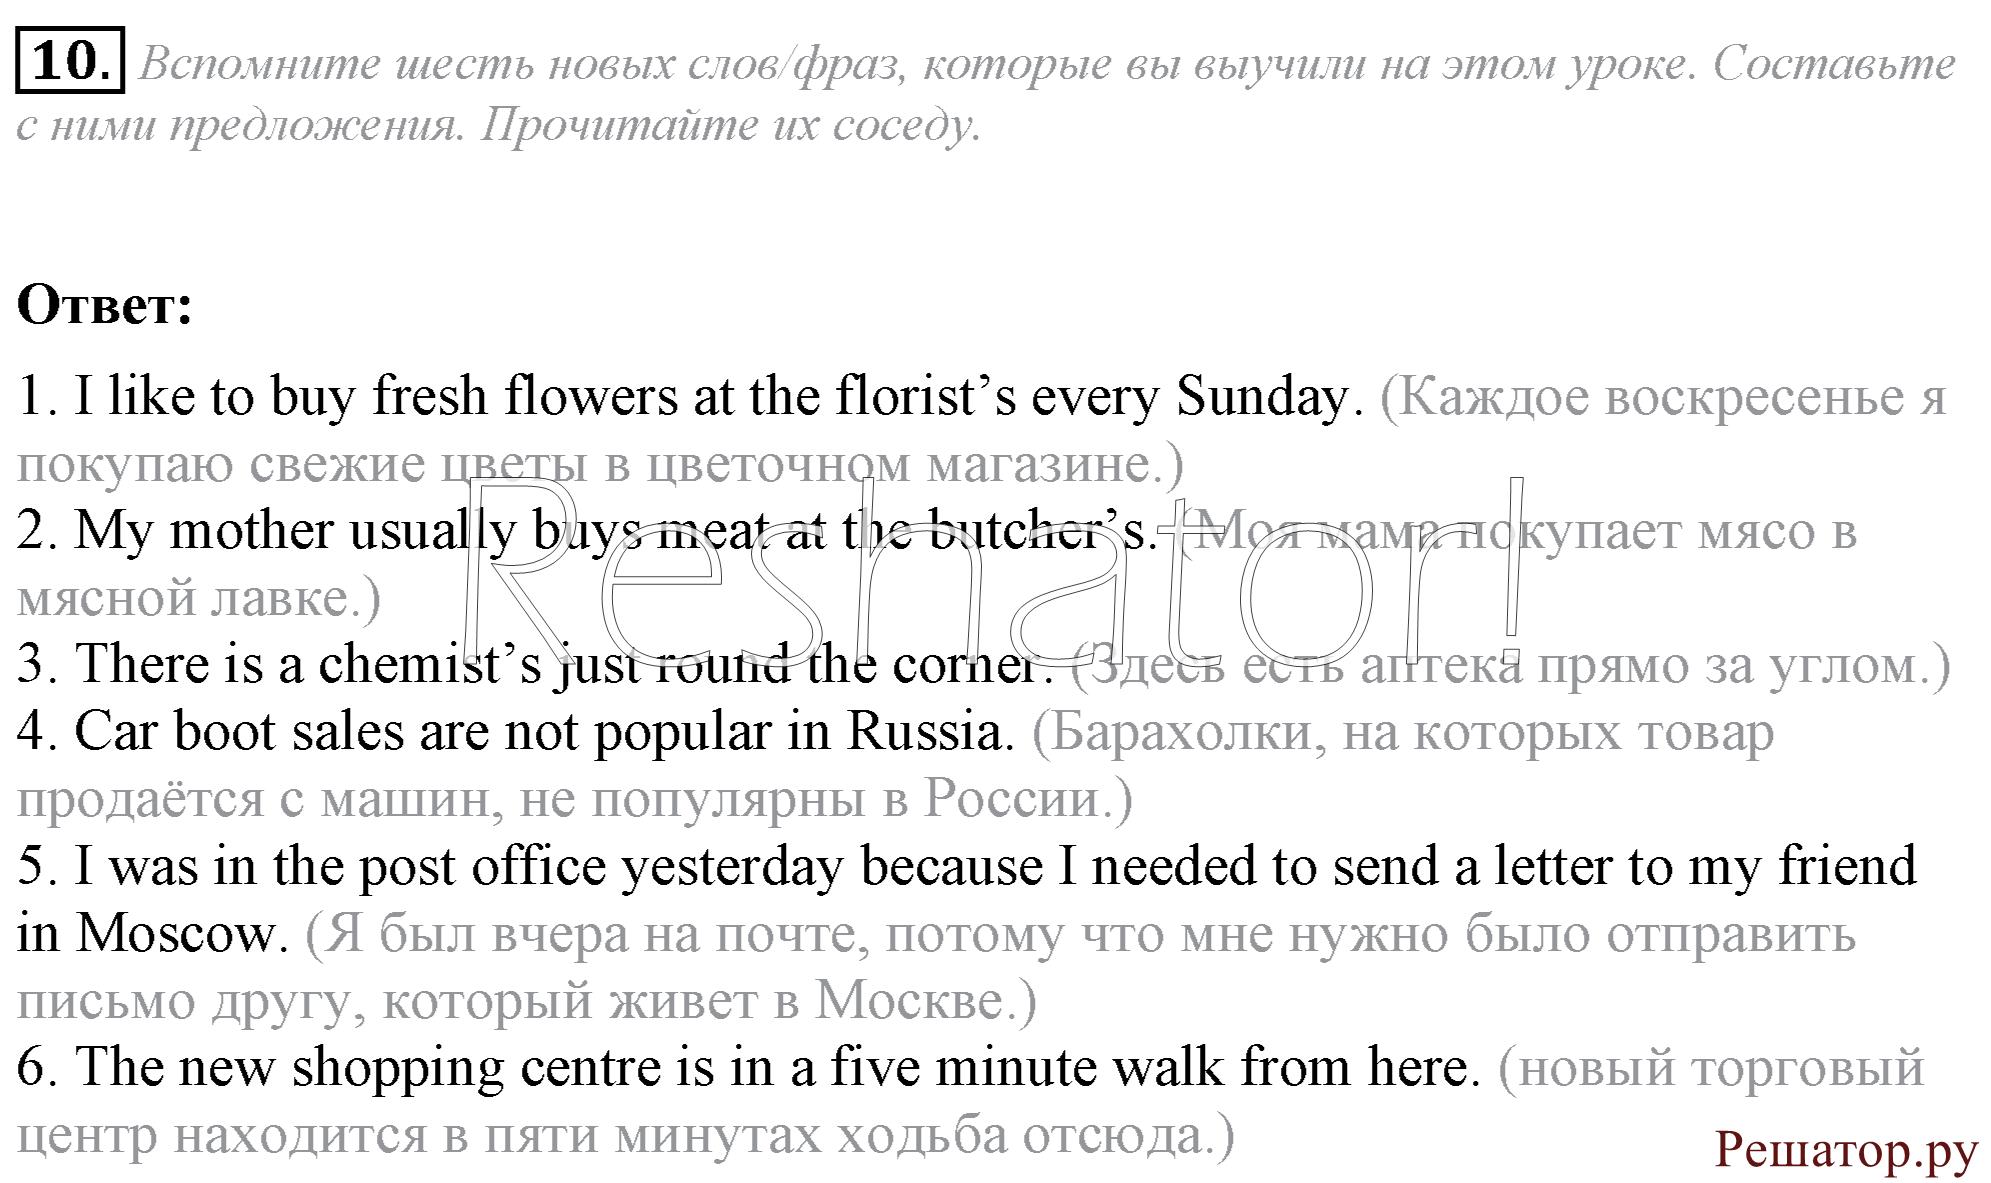 Гдз по английскому 8 класс ваулина дули перевод текстов